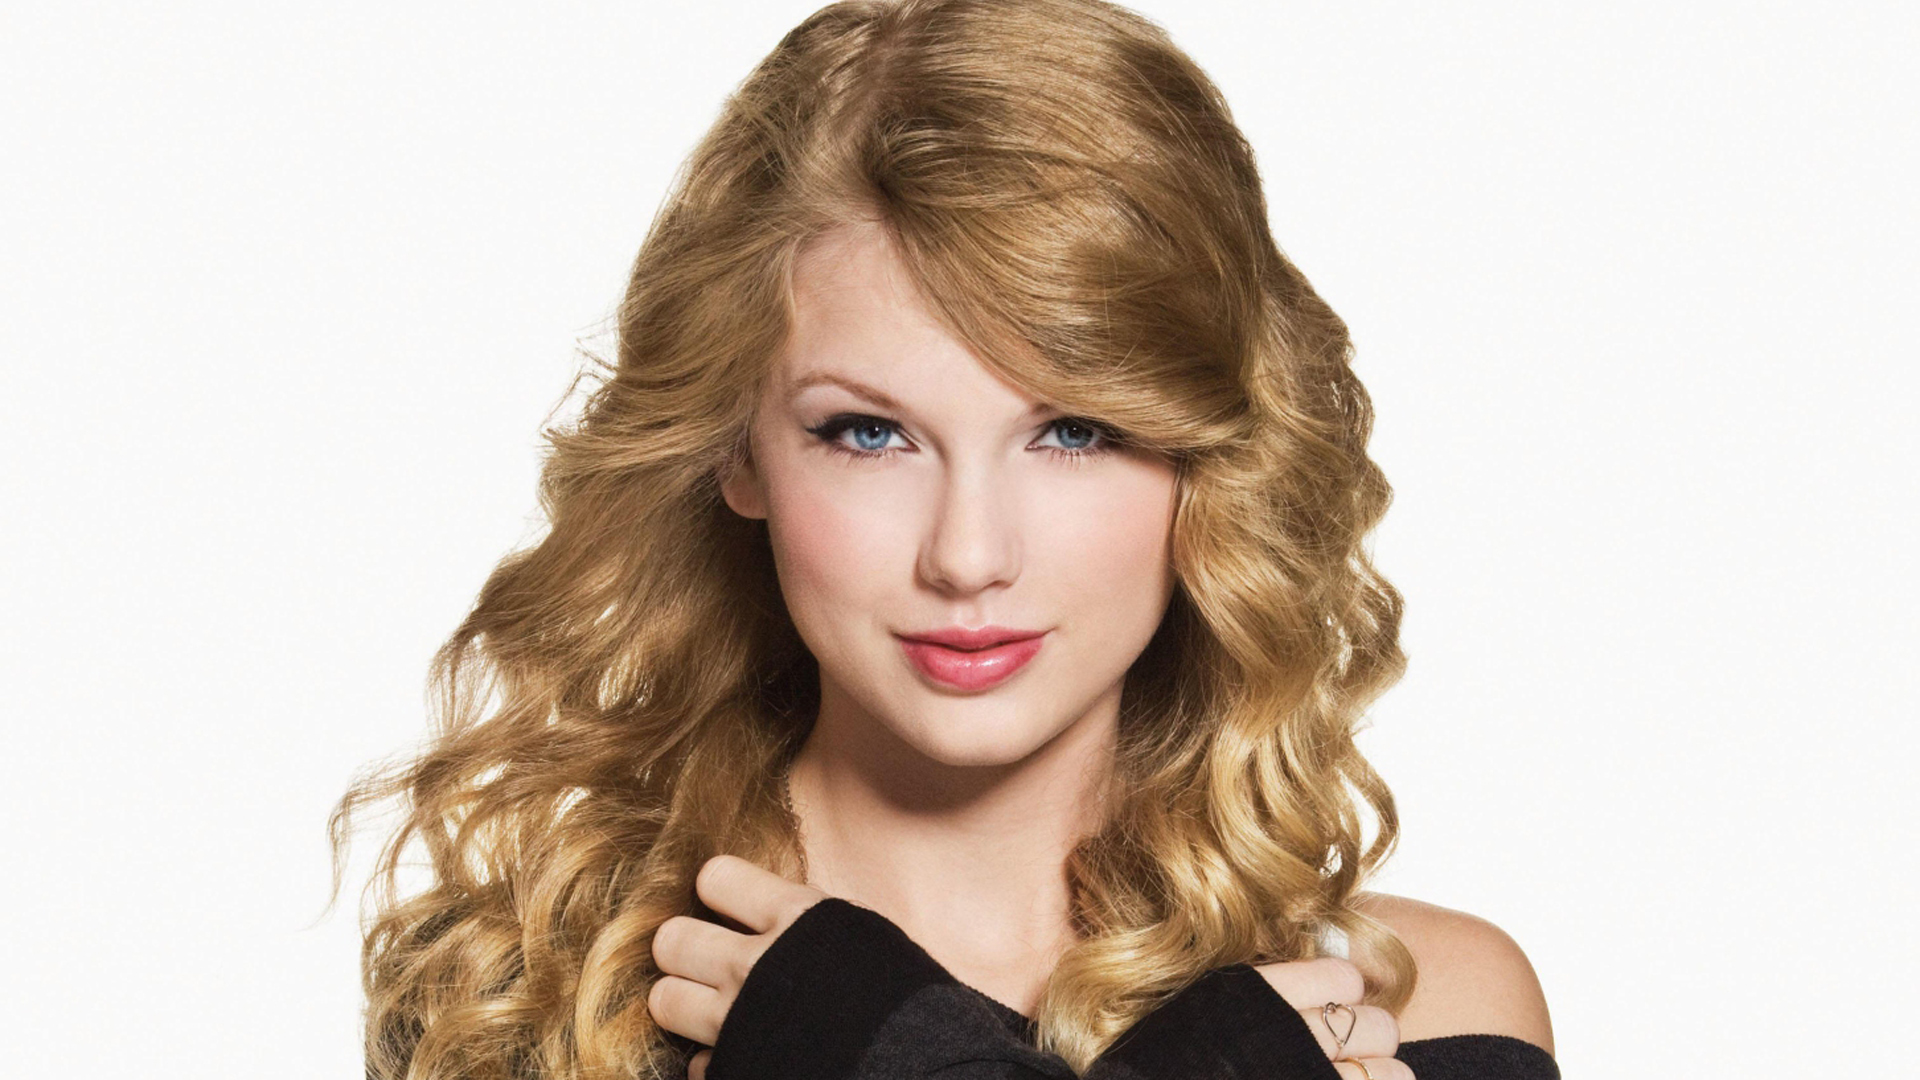 Taylor Swift Photos   Superstars Biography